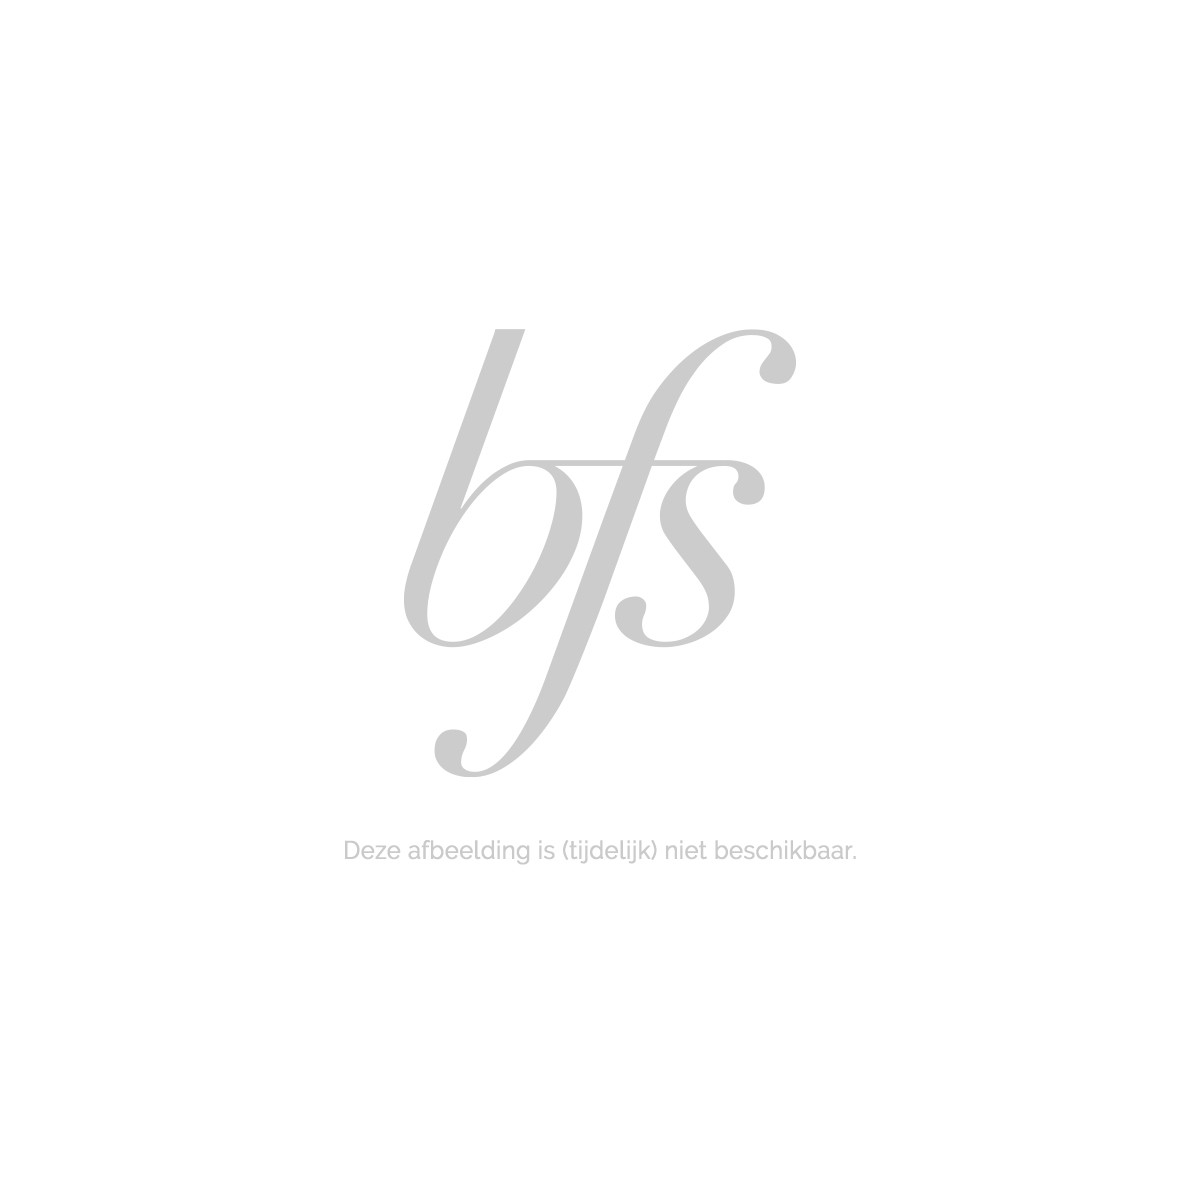 Balm Balm Bergamot Essential Oil 10Ml